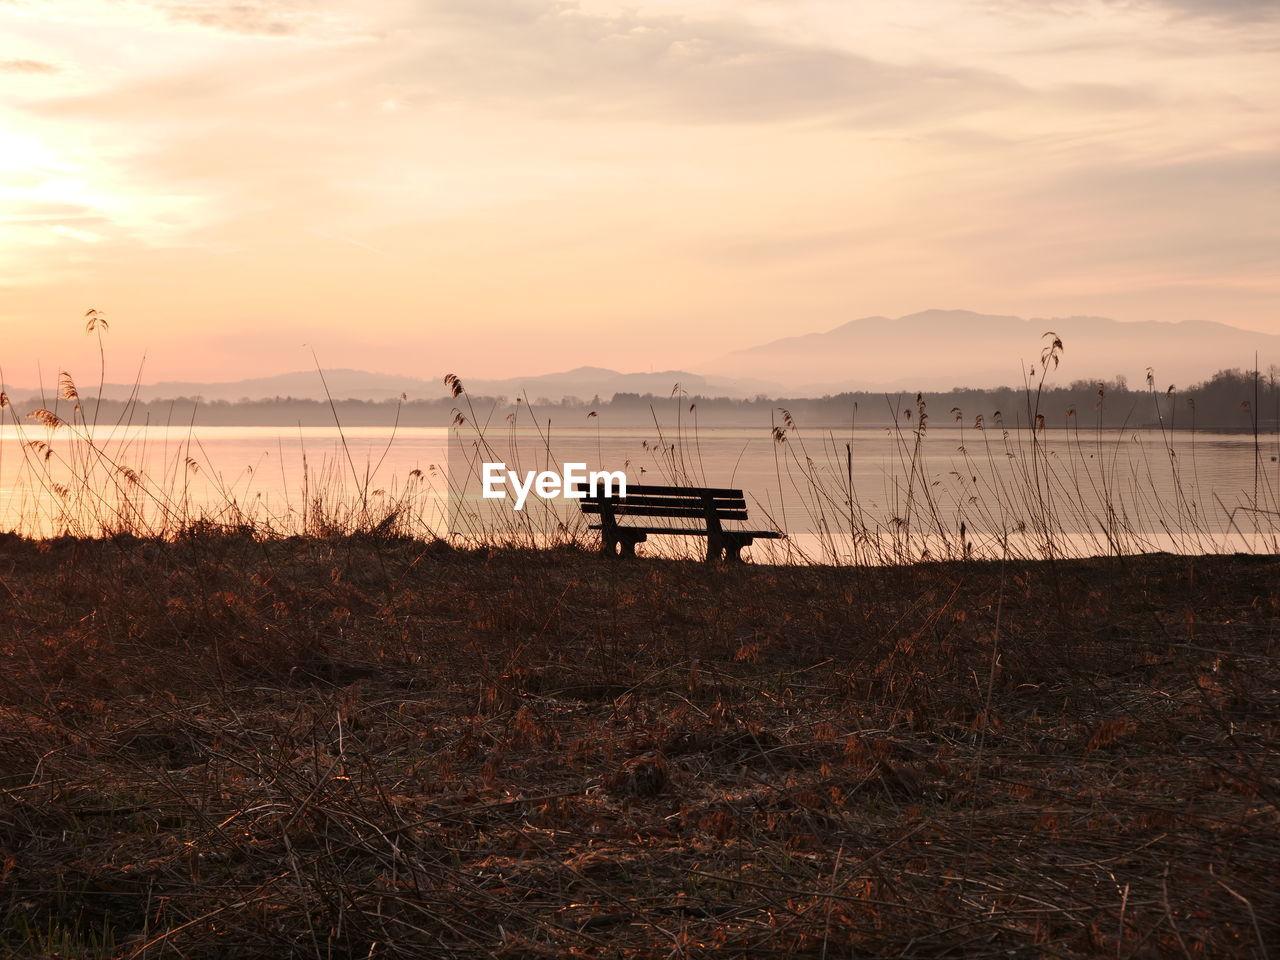 sky, water, sunset, tranquility, scenics - nature, beauty in nature, tranquil scene, nature, cloud - sky, non-urban scene, beach, land, lake, no people, idyllic, outdoors, grass, plant, orange color